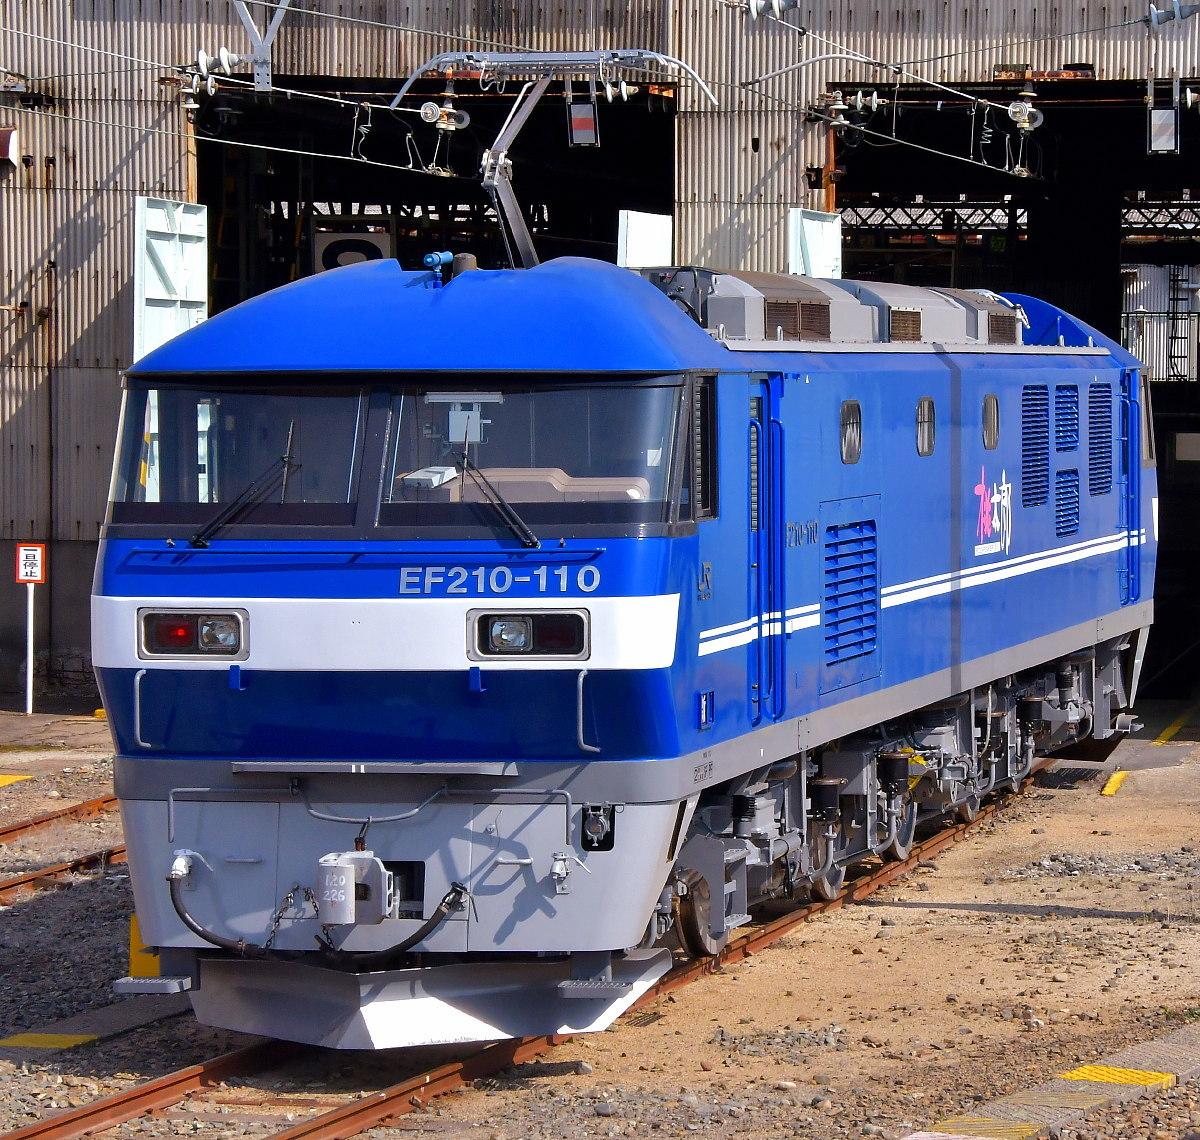 EF210-110新塗装化_a0251146_23452178.jpg